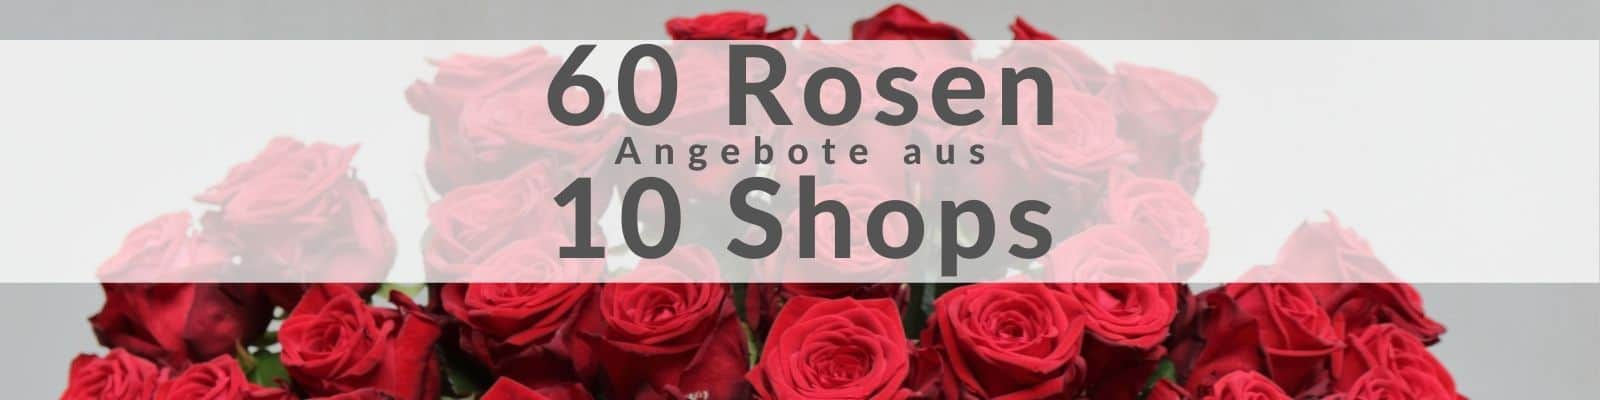 60 Rosen verschicken